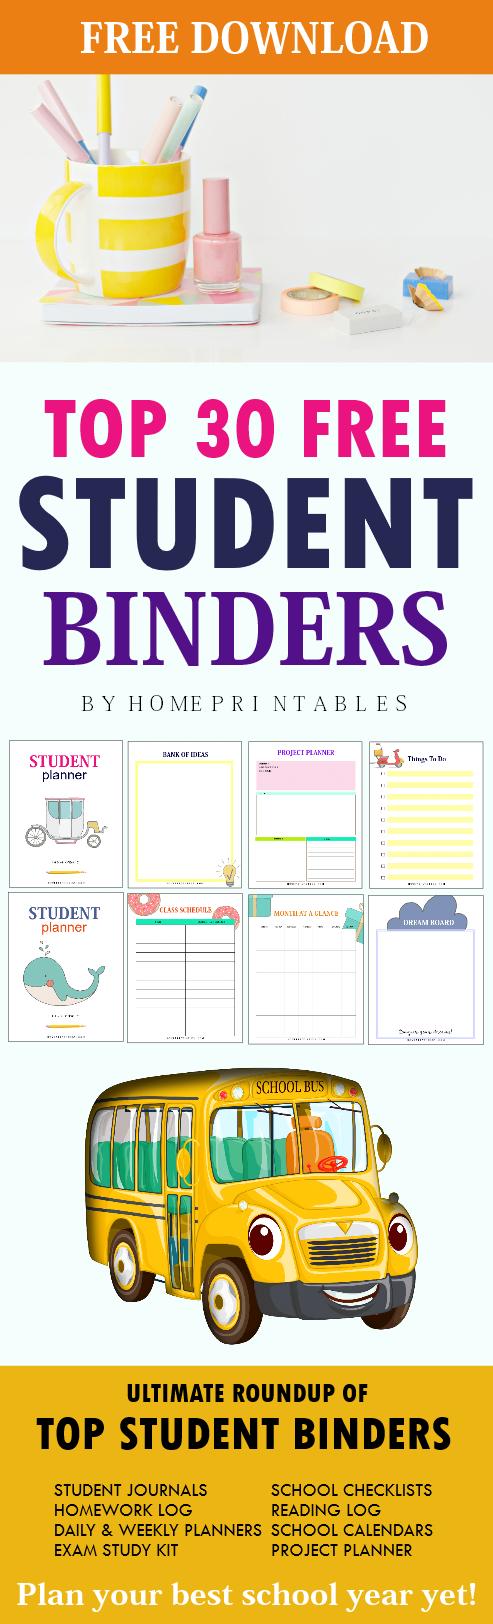 free student binder printables